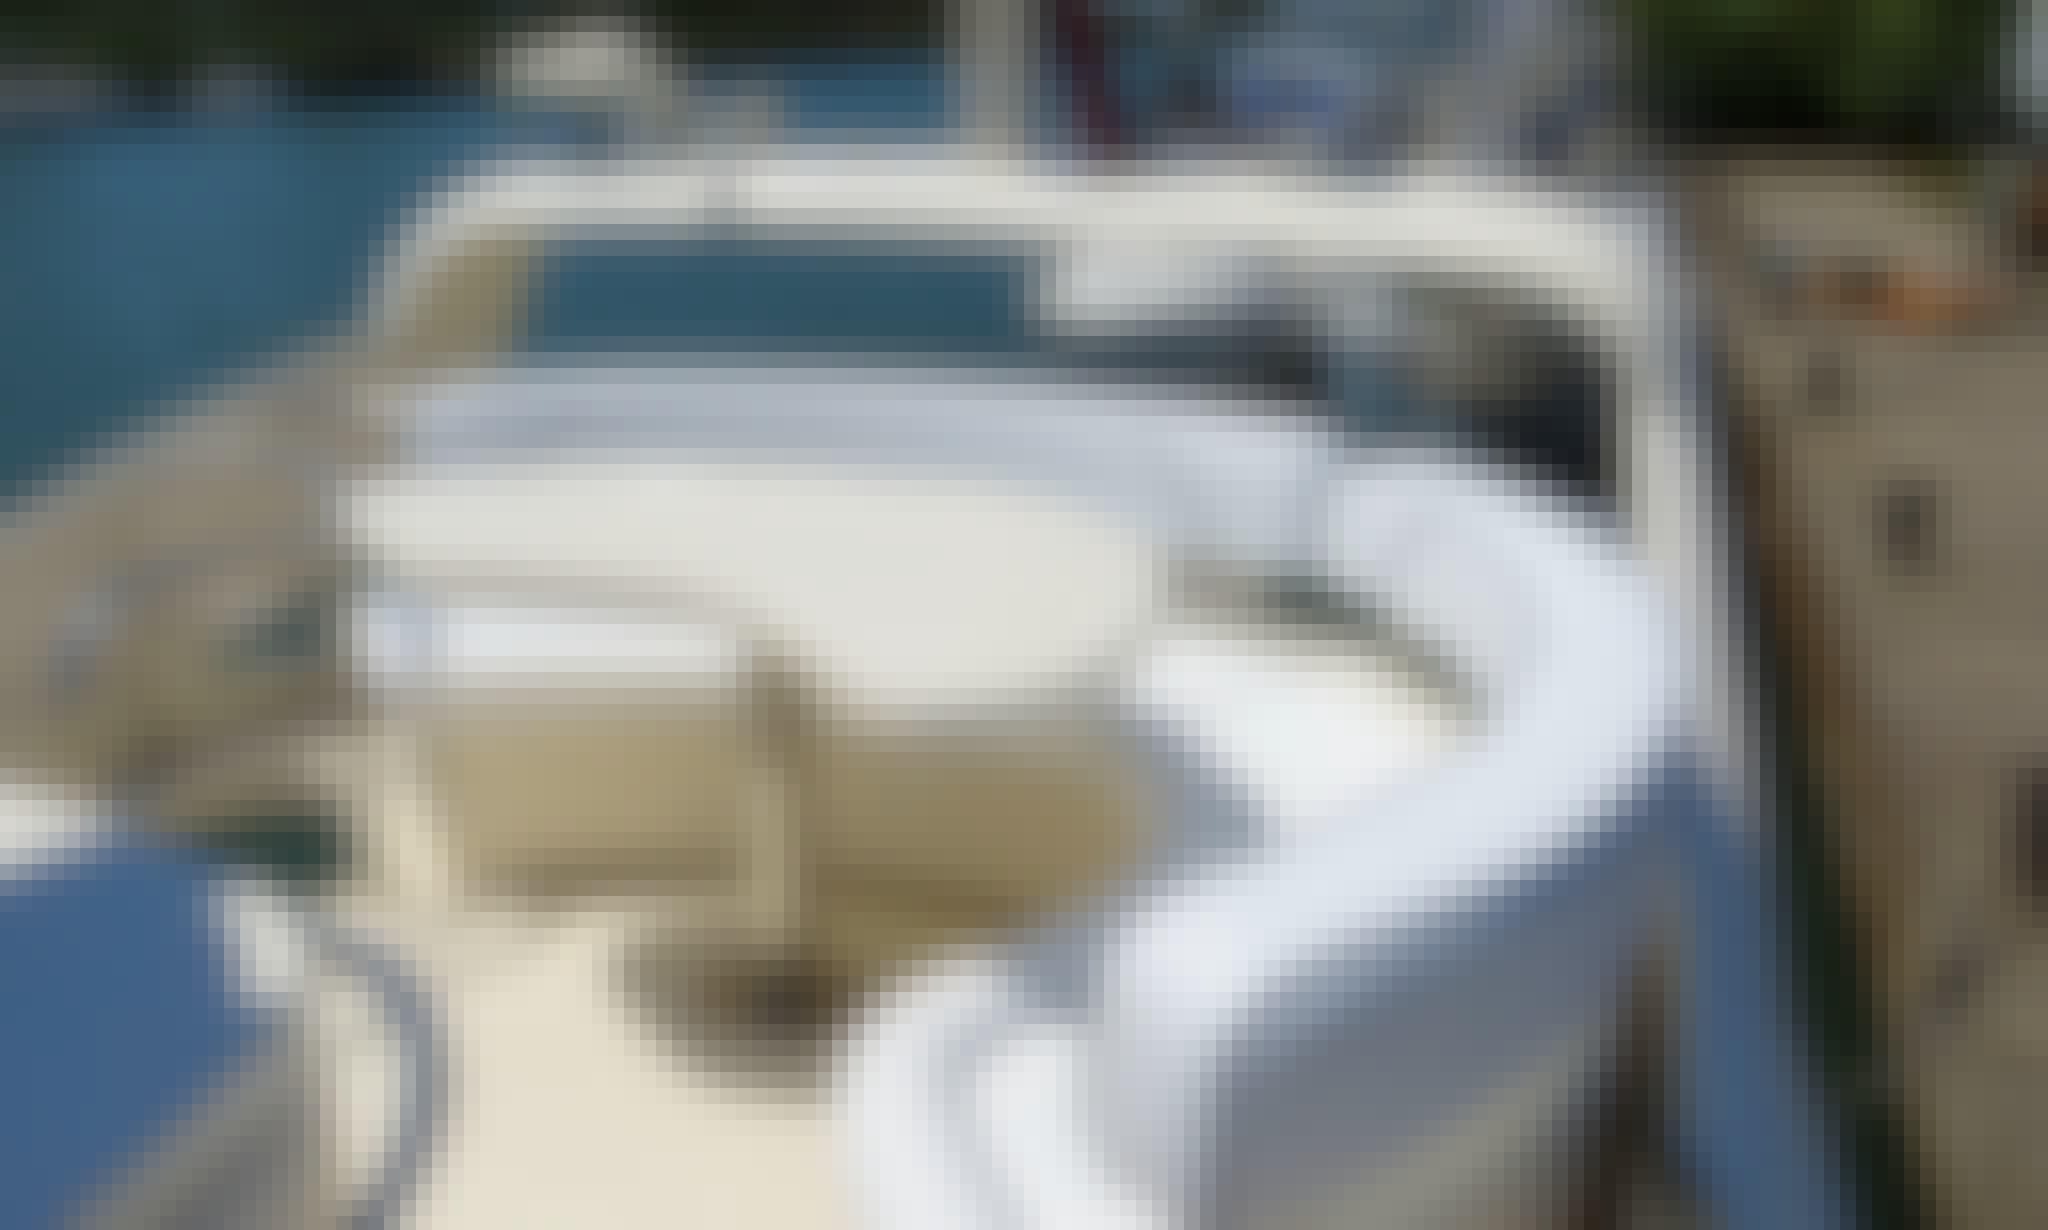 Aicon 52 Motor Yacht Charter in Roma, Italy